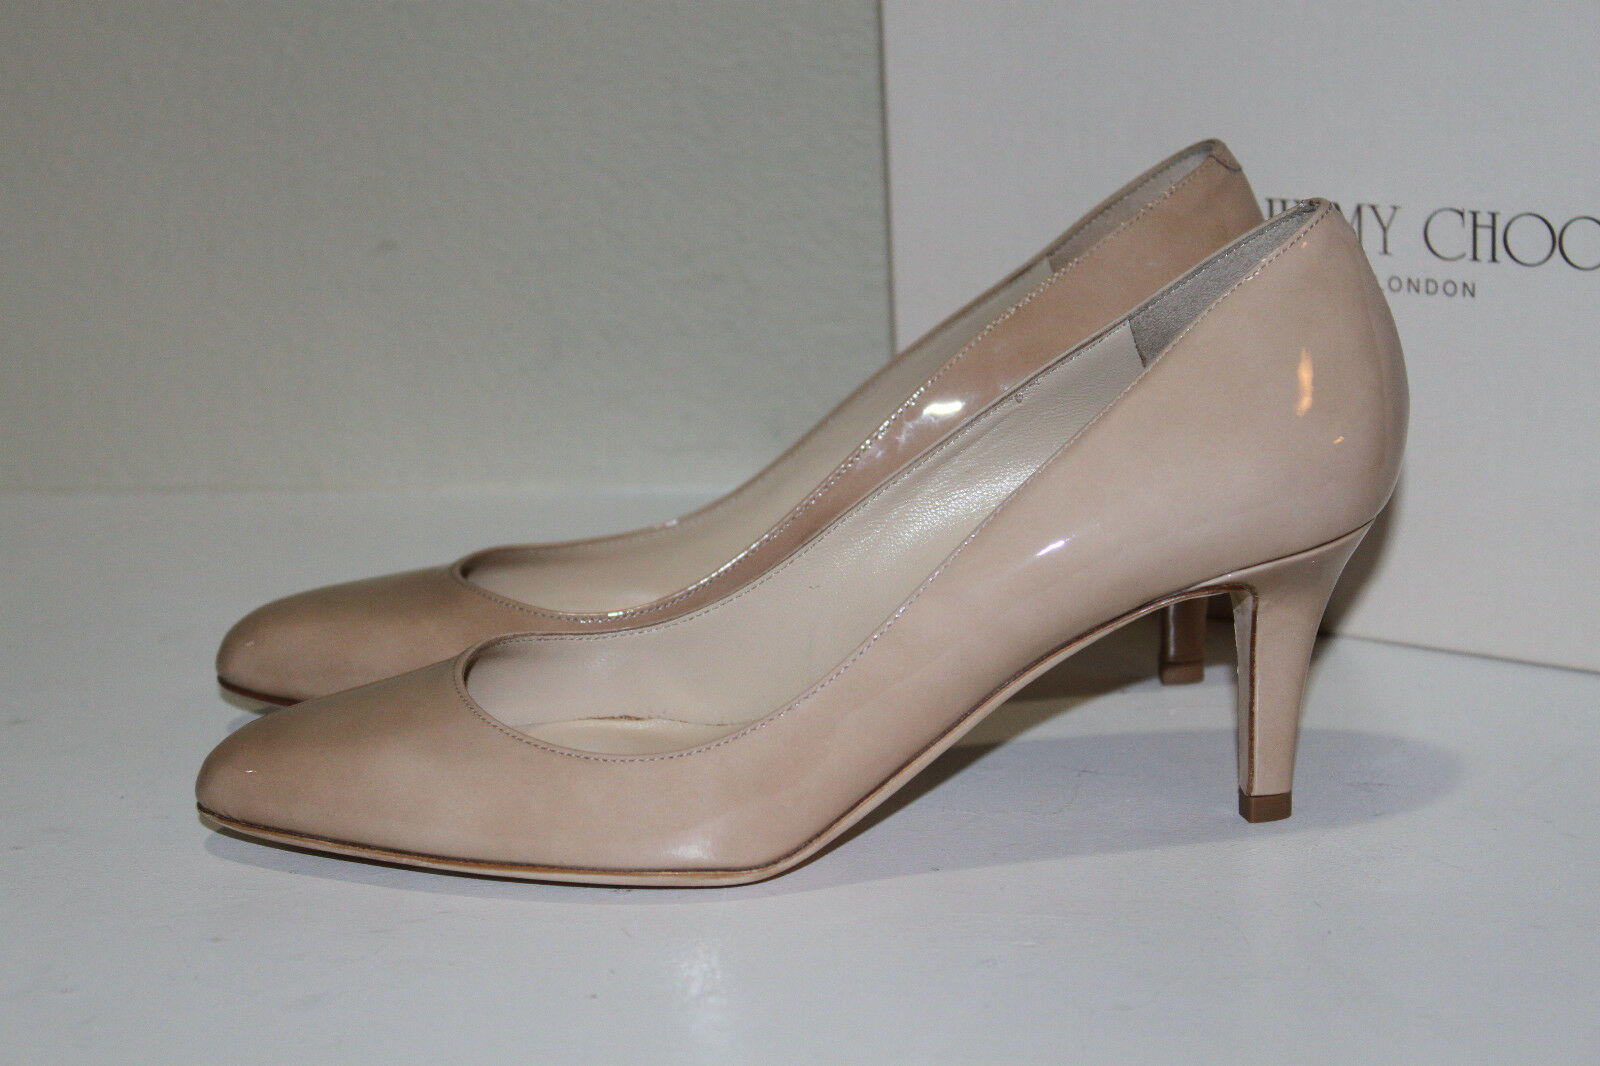 New sz 9.5   39.5 Jimmy Choo Vega Vega Choo Nude Beige Patent Leather Pumps Heel schuhe 1c8e89